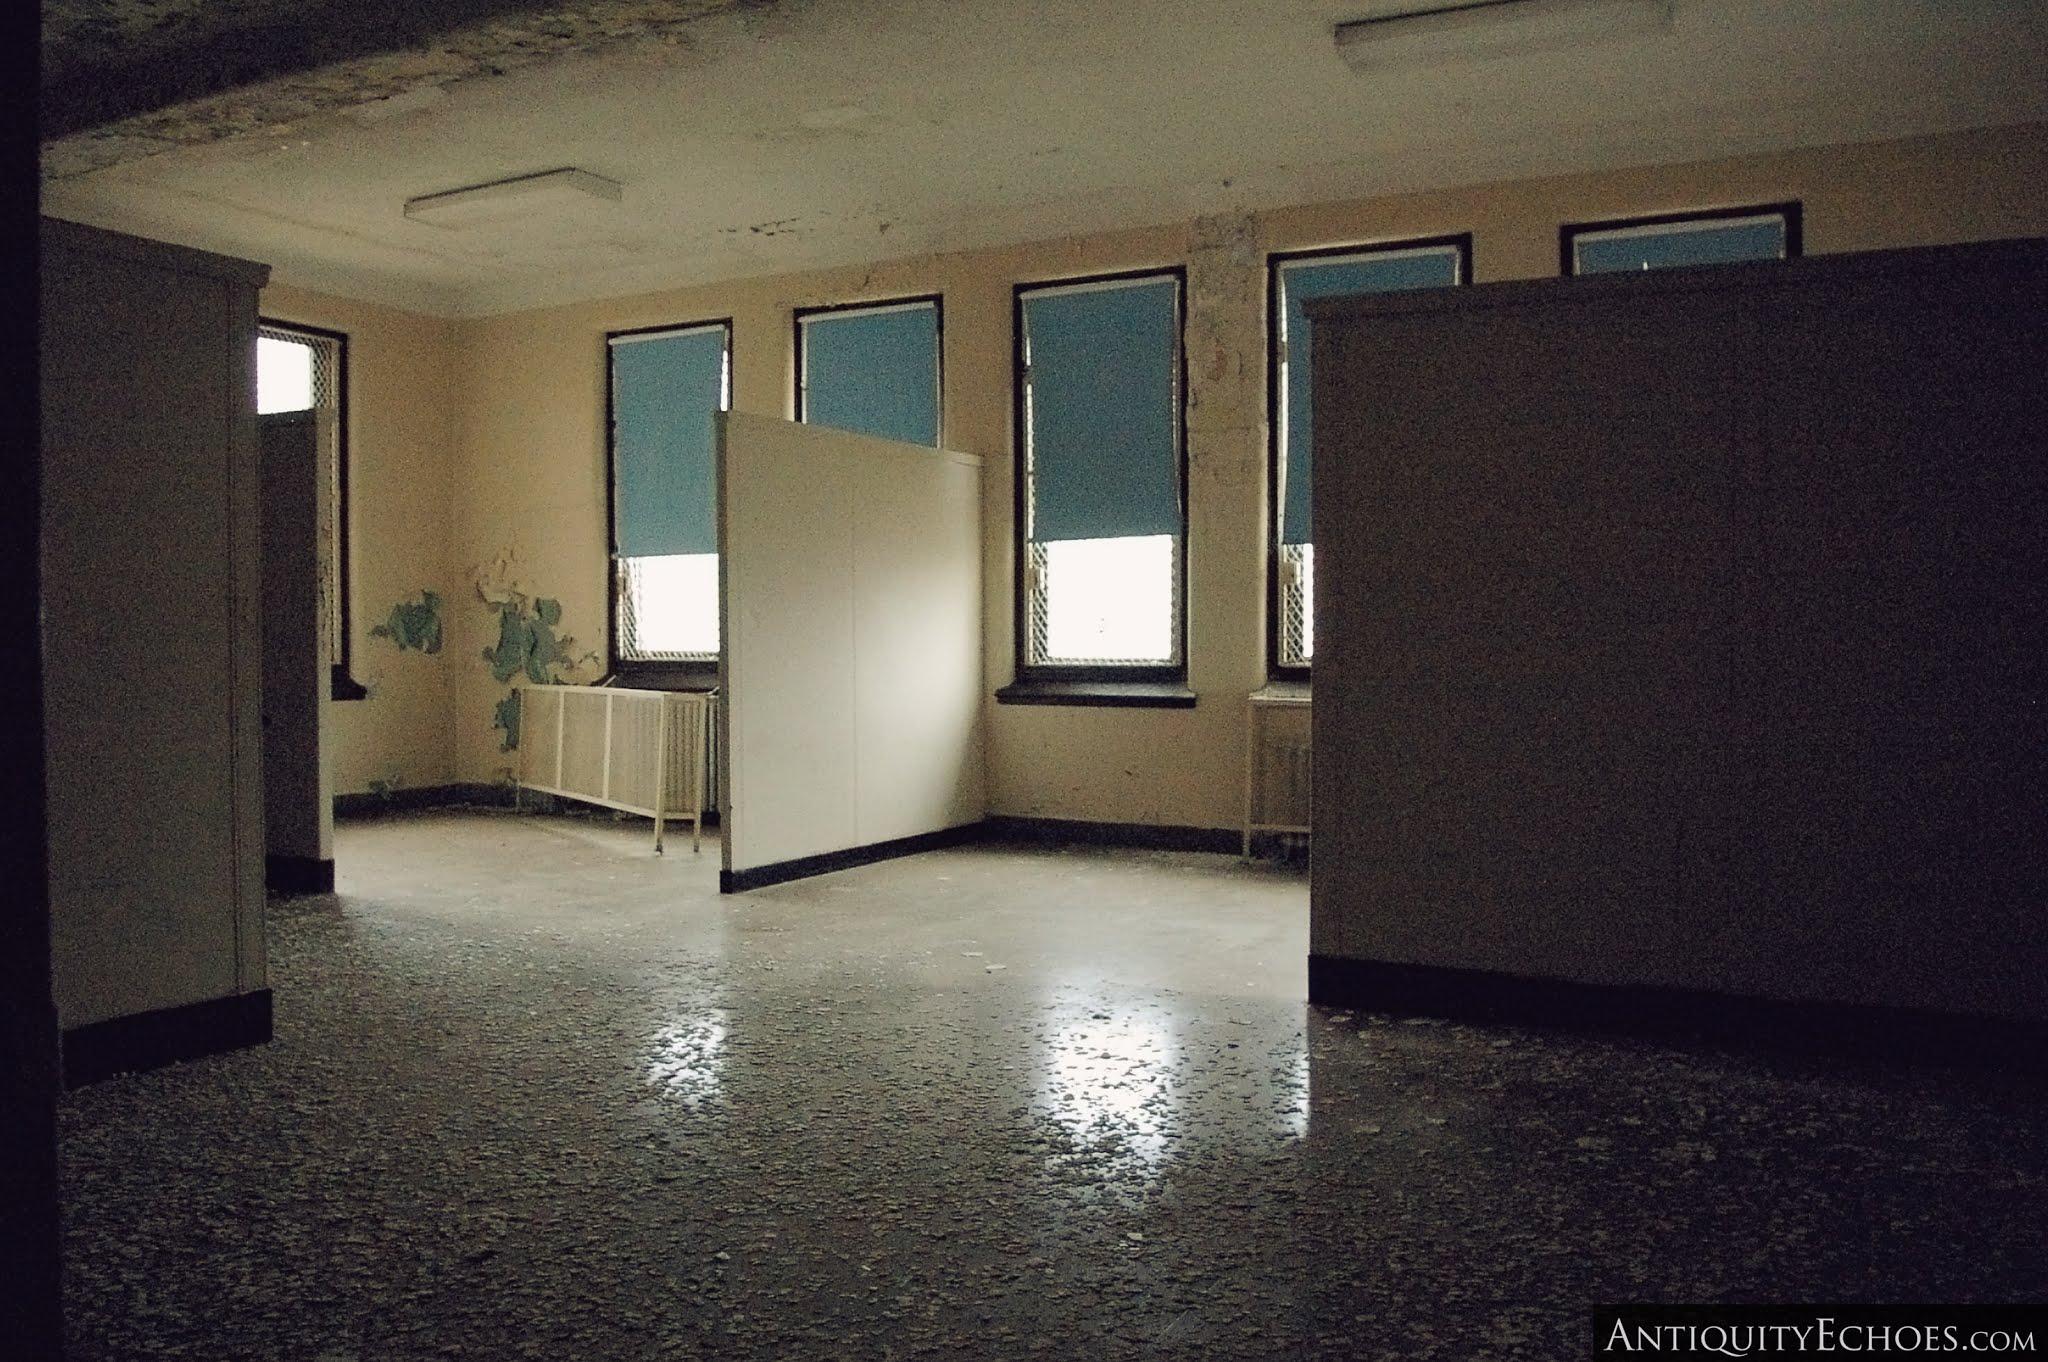 Overbrook Asylum - Segmented Dayroom